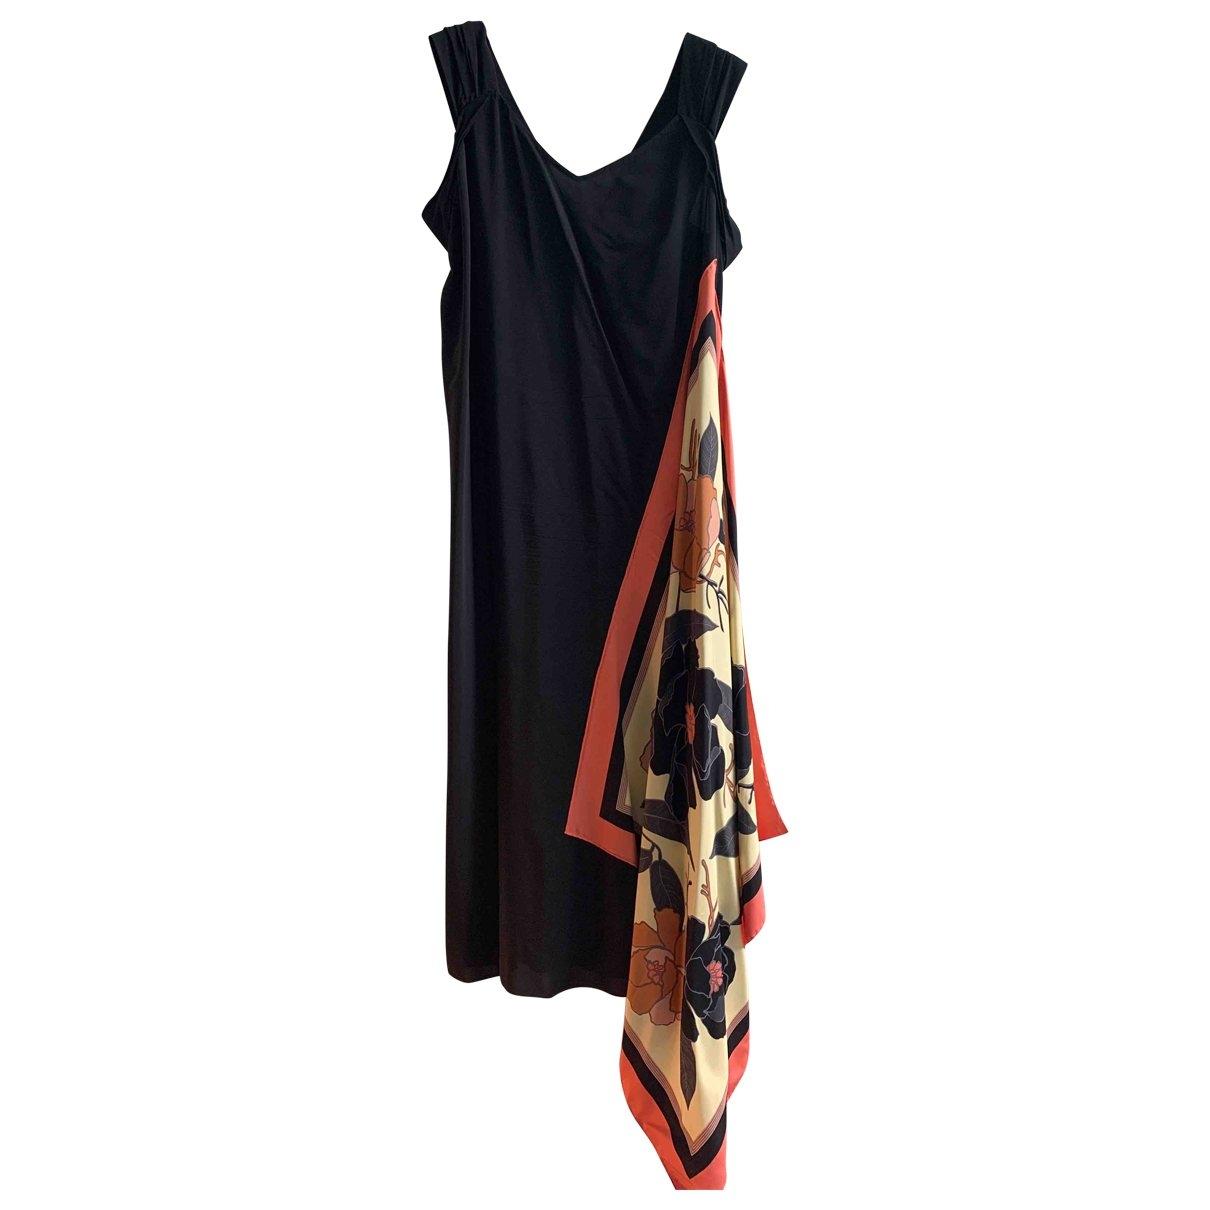 Dries Van Noten \N Black dress for Women 40 FR